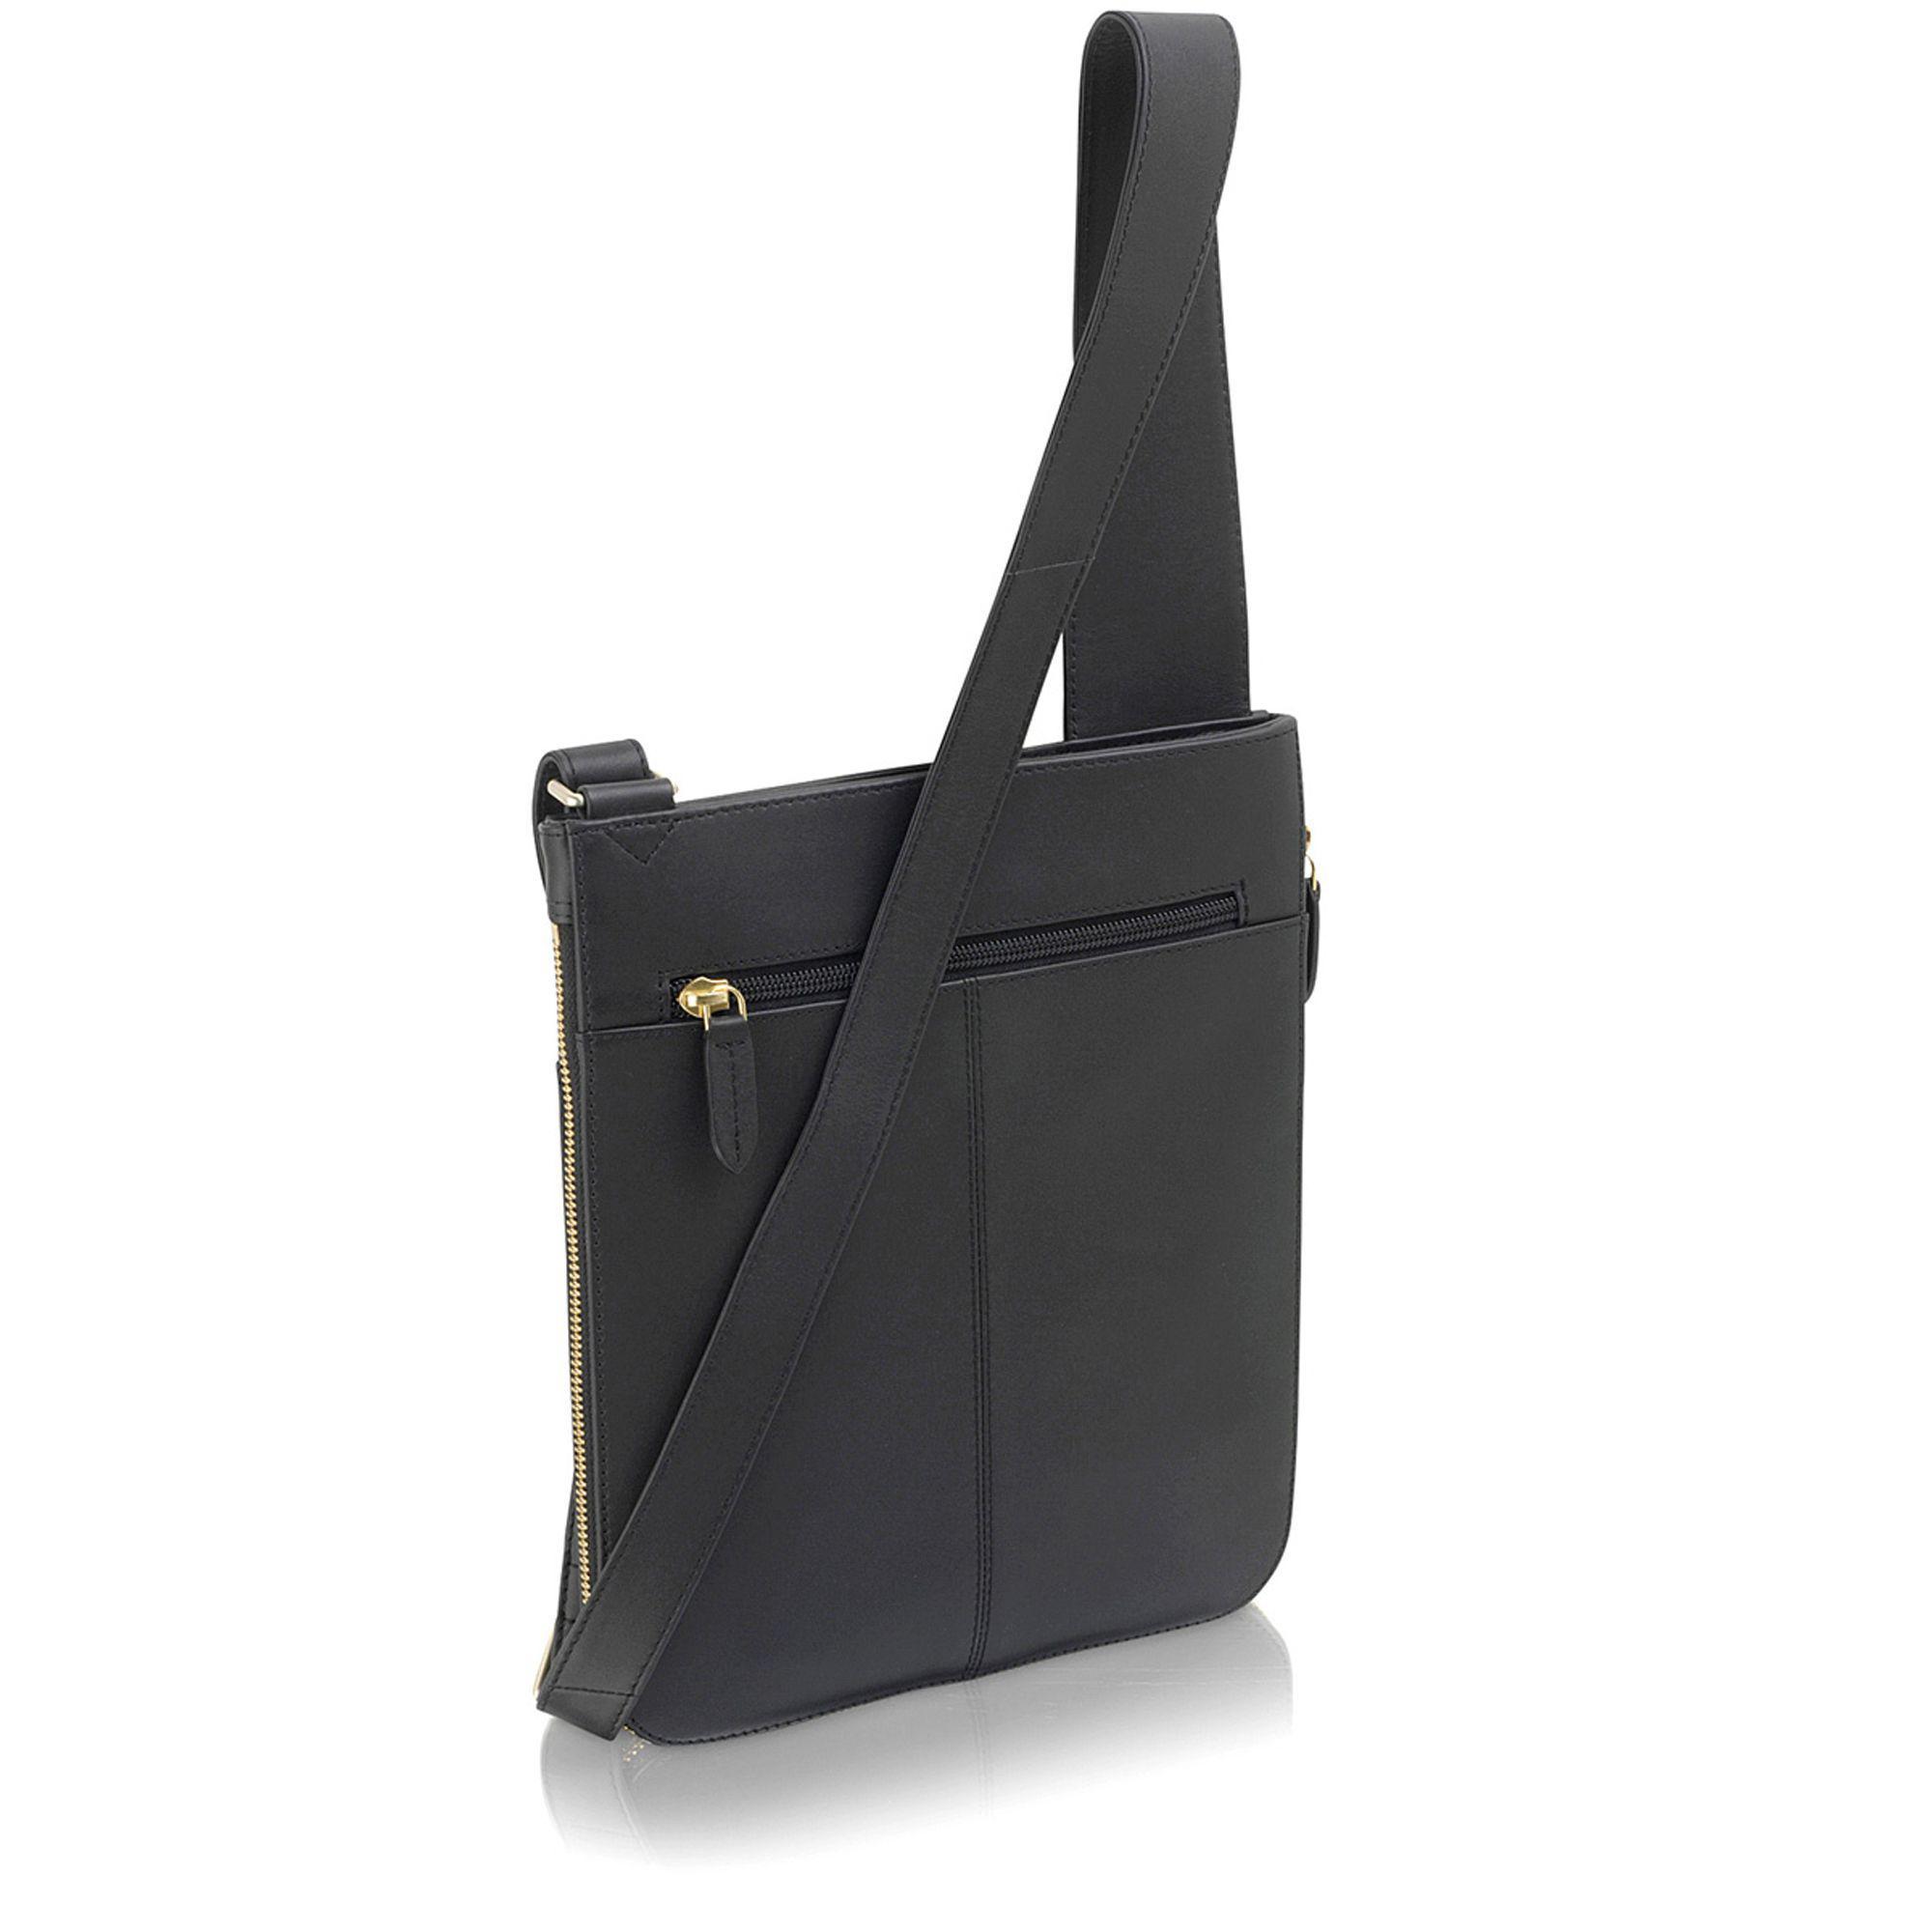 Radley - Black Pocket Bag Medium Zip-top Cross Body Bag - Lyst. View  fullscreen 904fb1fc01815